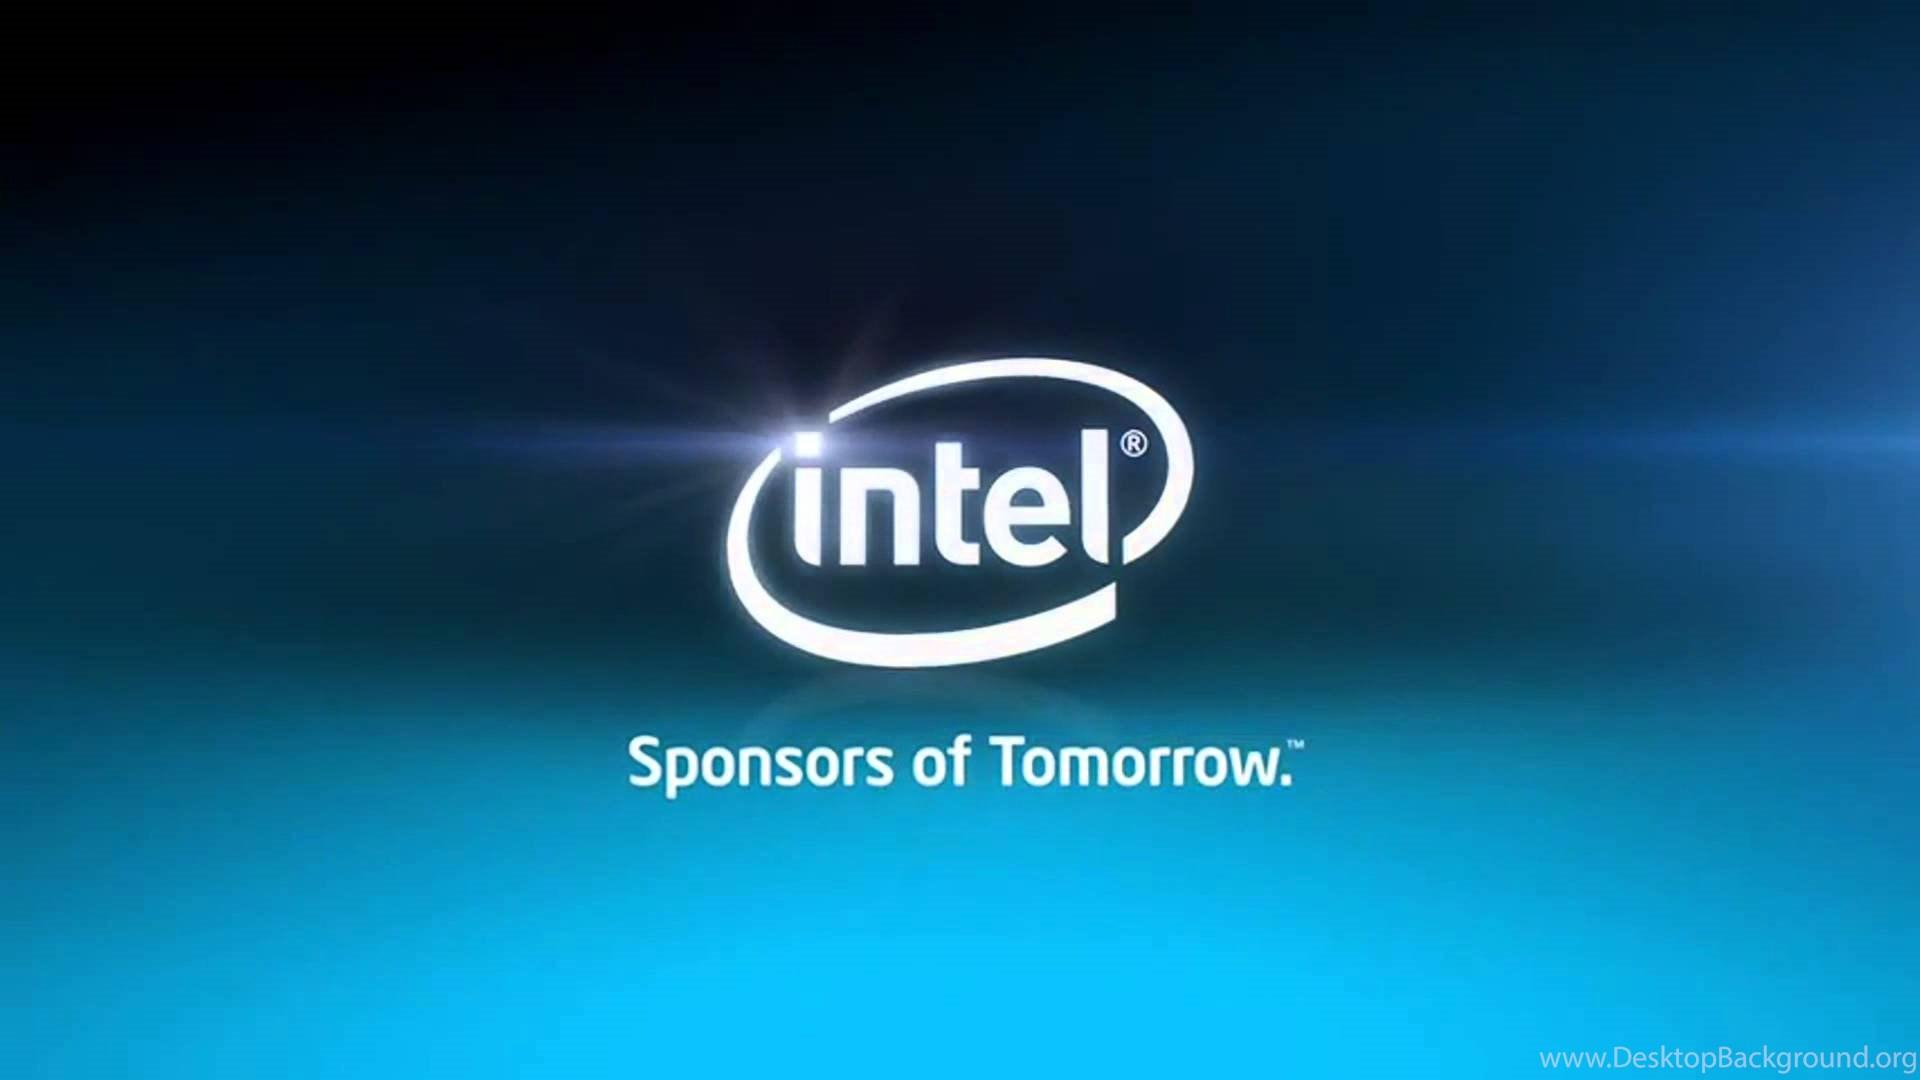 Intel Logo Wallpapers Awesome Resolution Desktop Background